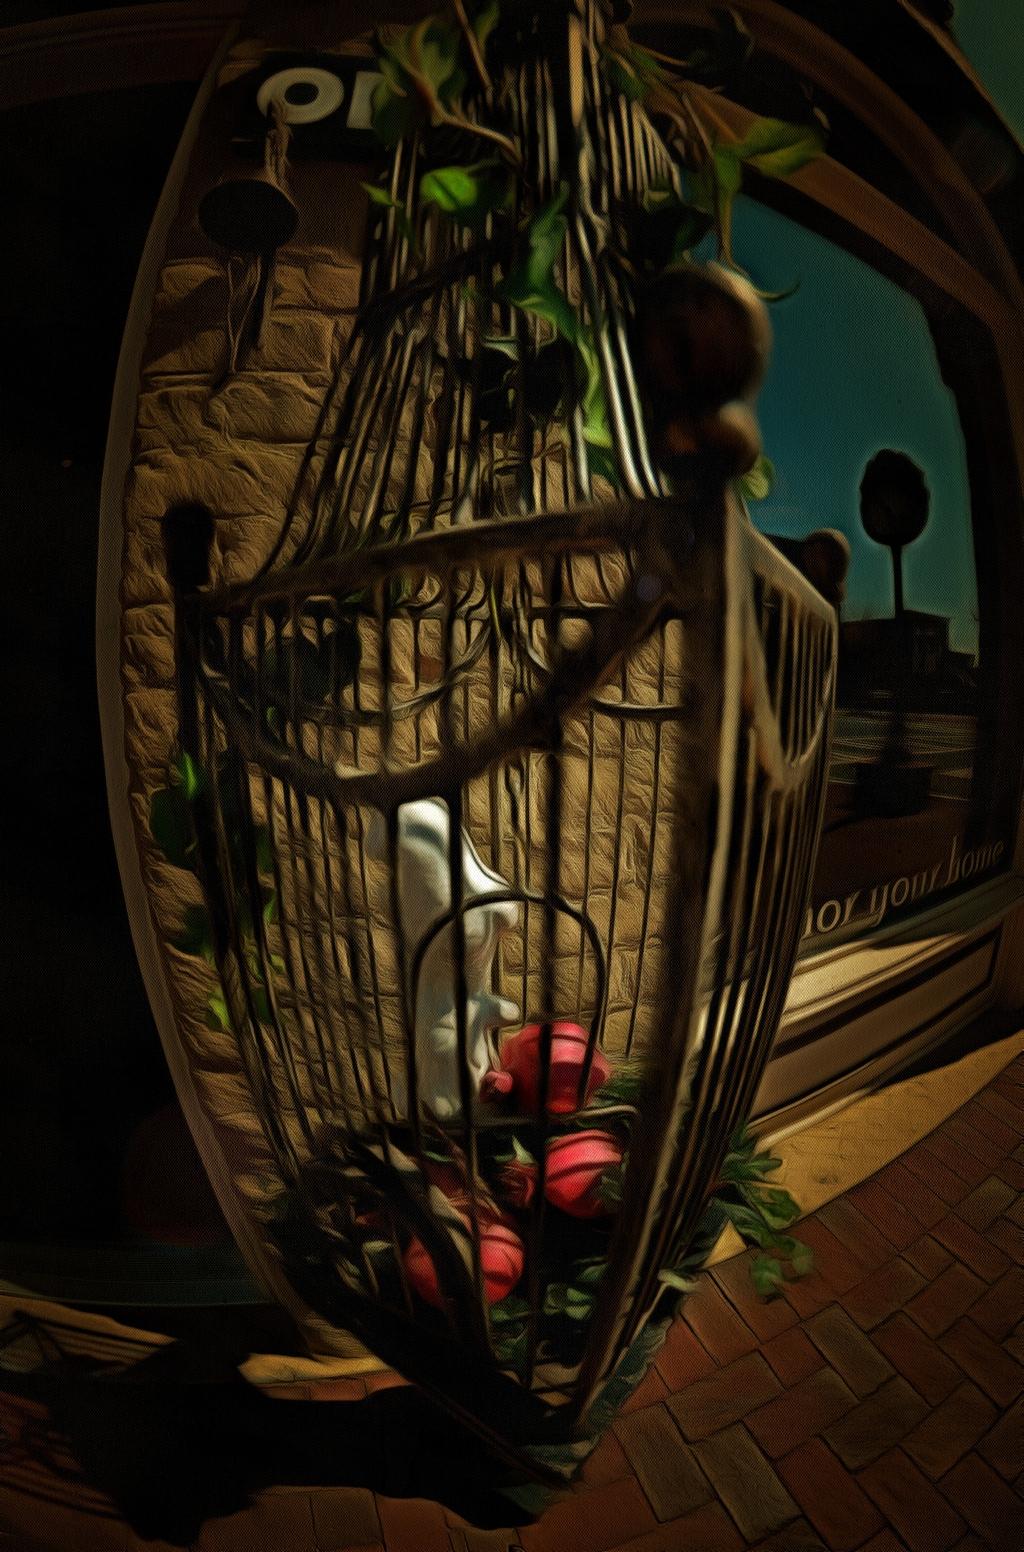 2020.06.09 3D Senoia edited